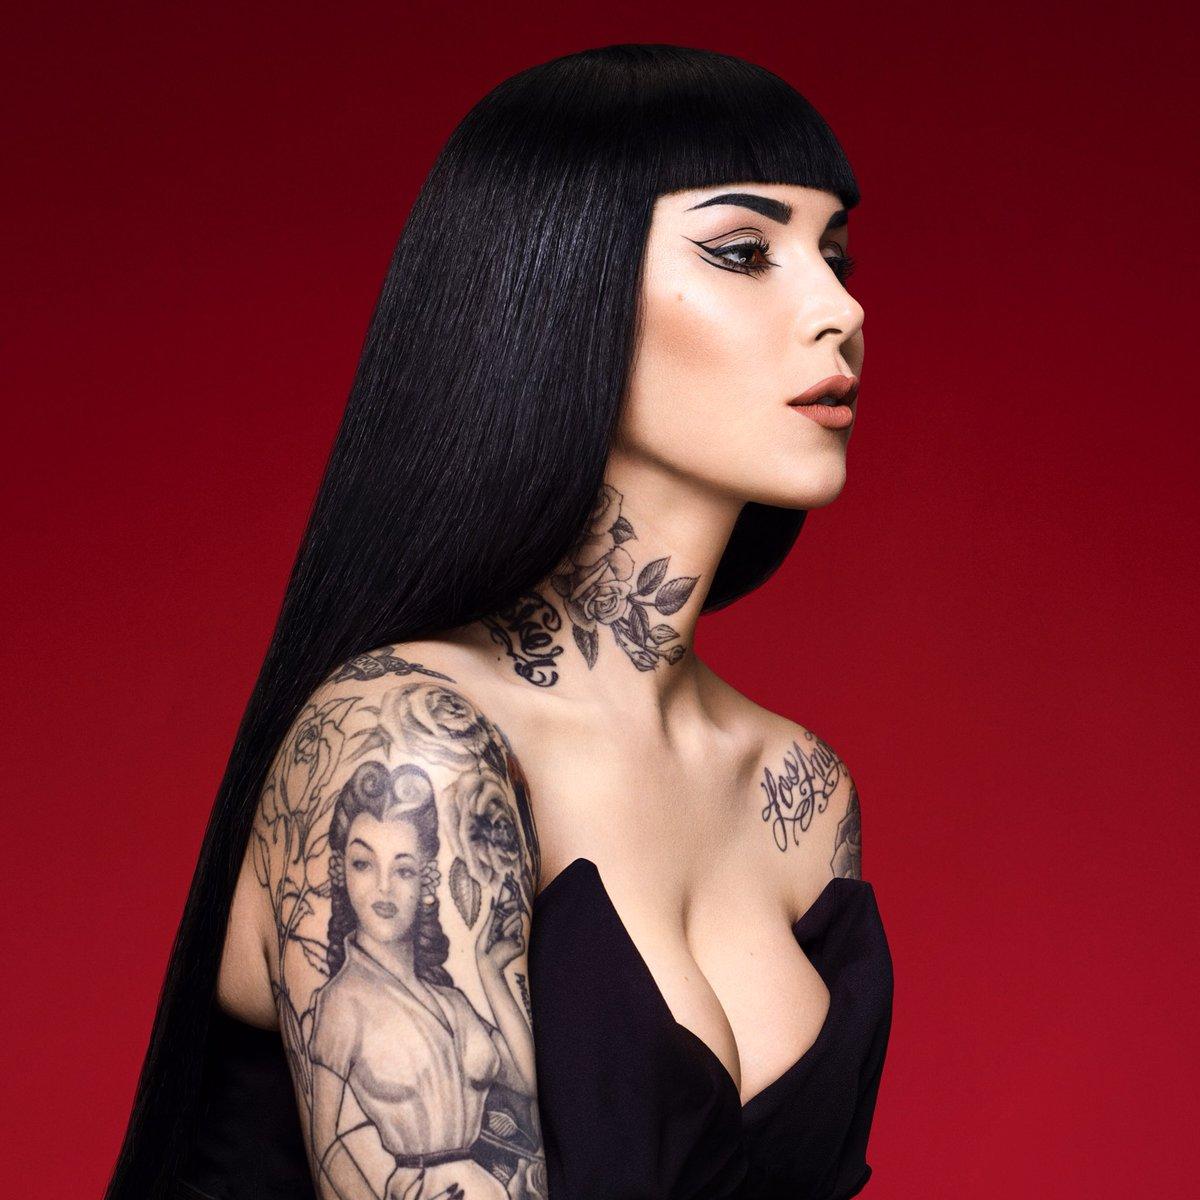 Kat Von D On Twitter Tattoo Liner Still My All Time Fave